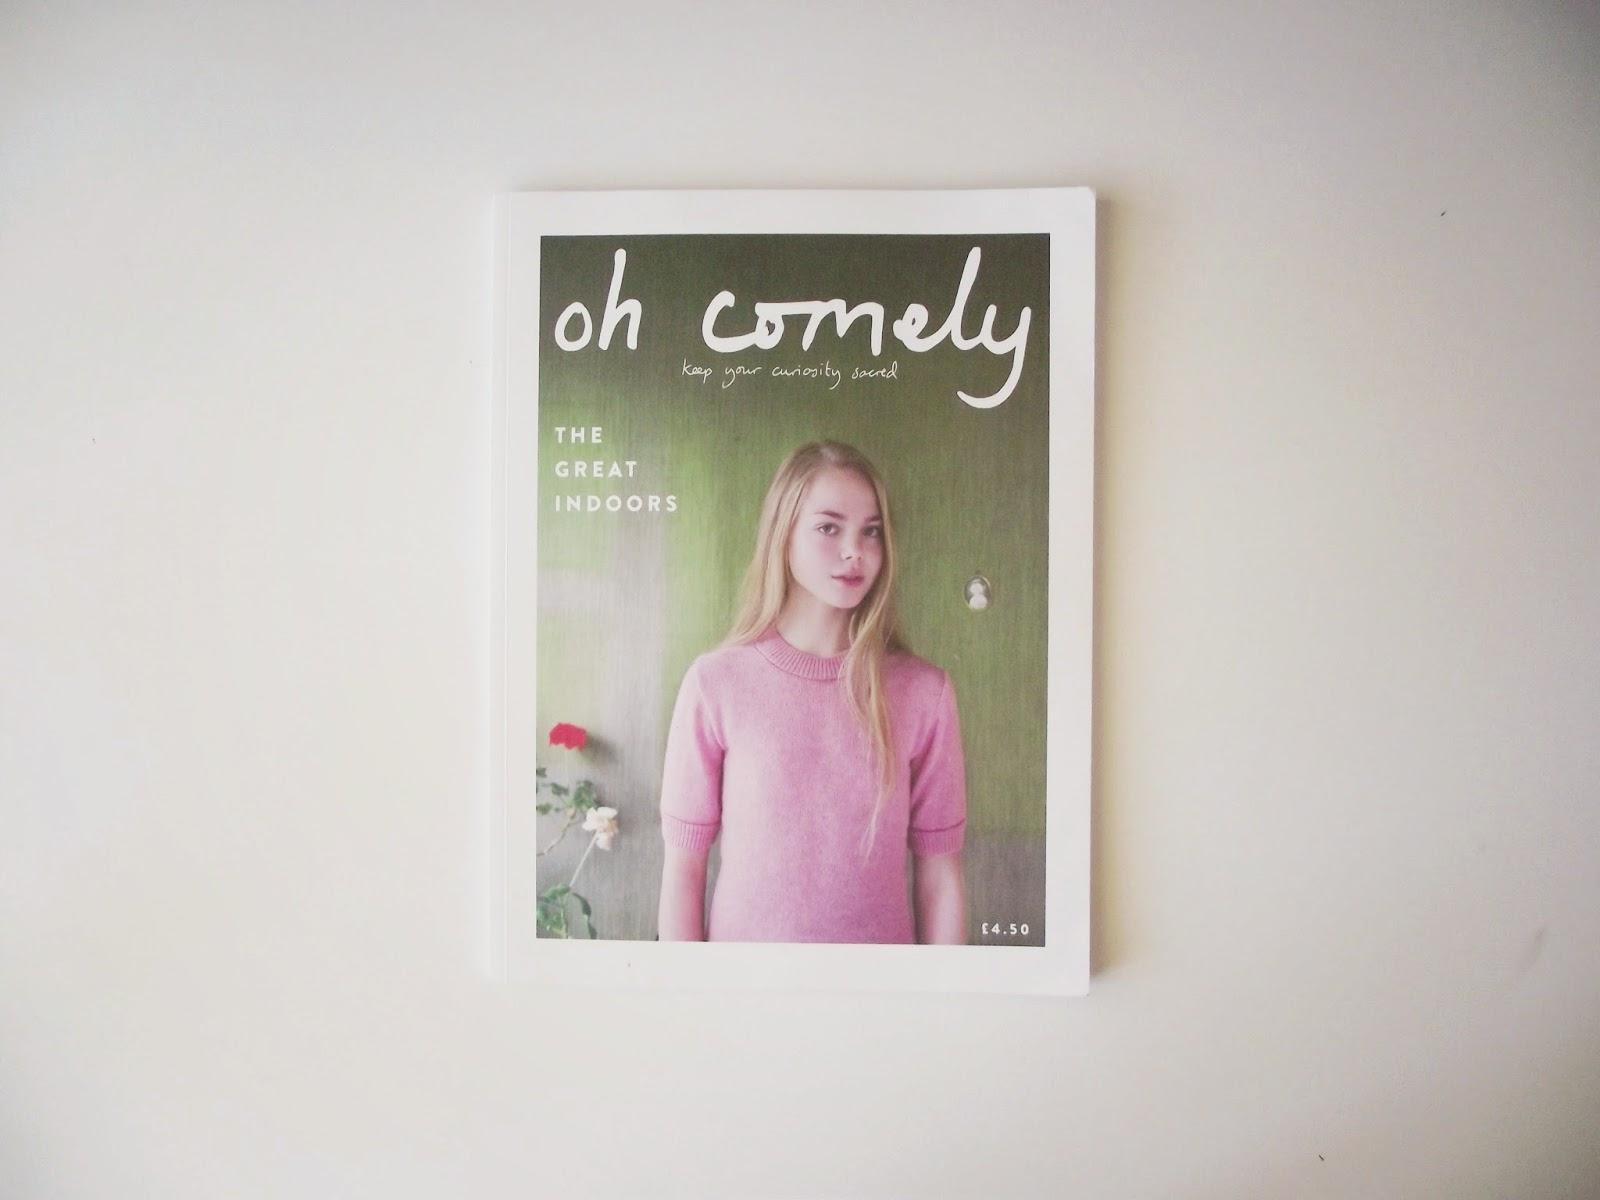 Oh Comely Magazine, magazine of the moment, insightful magazines